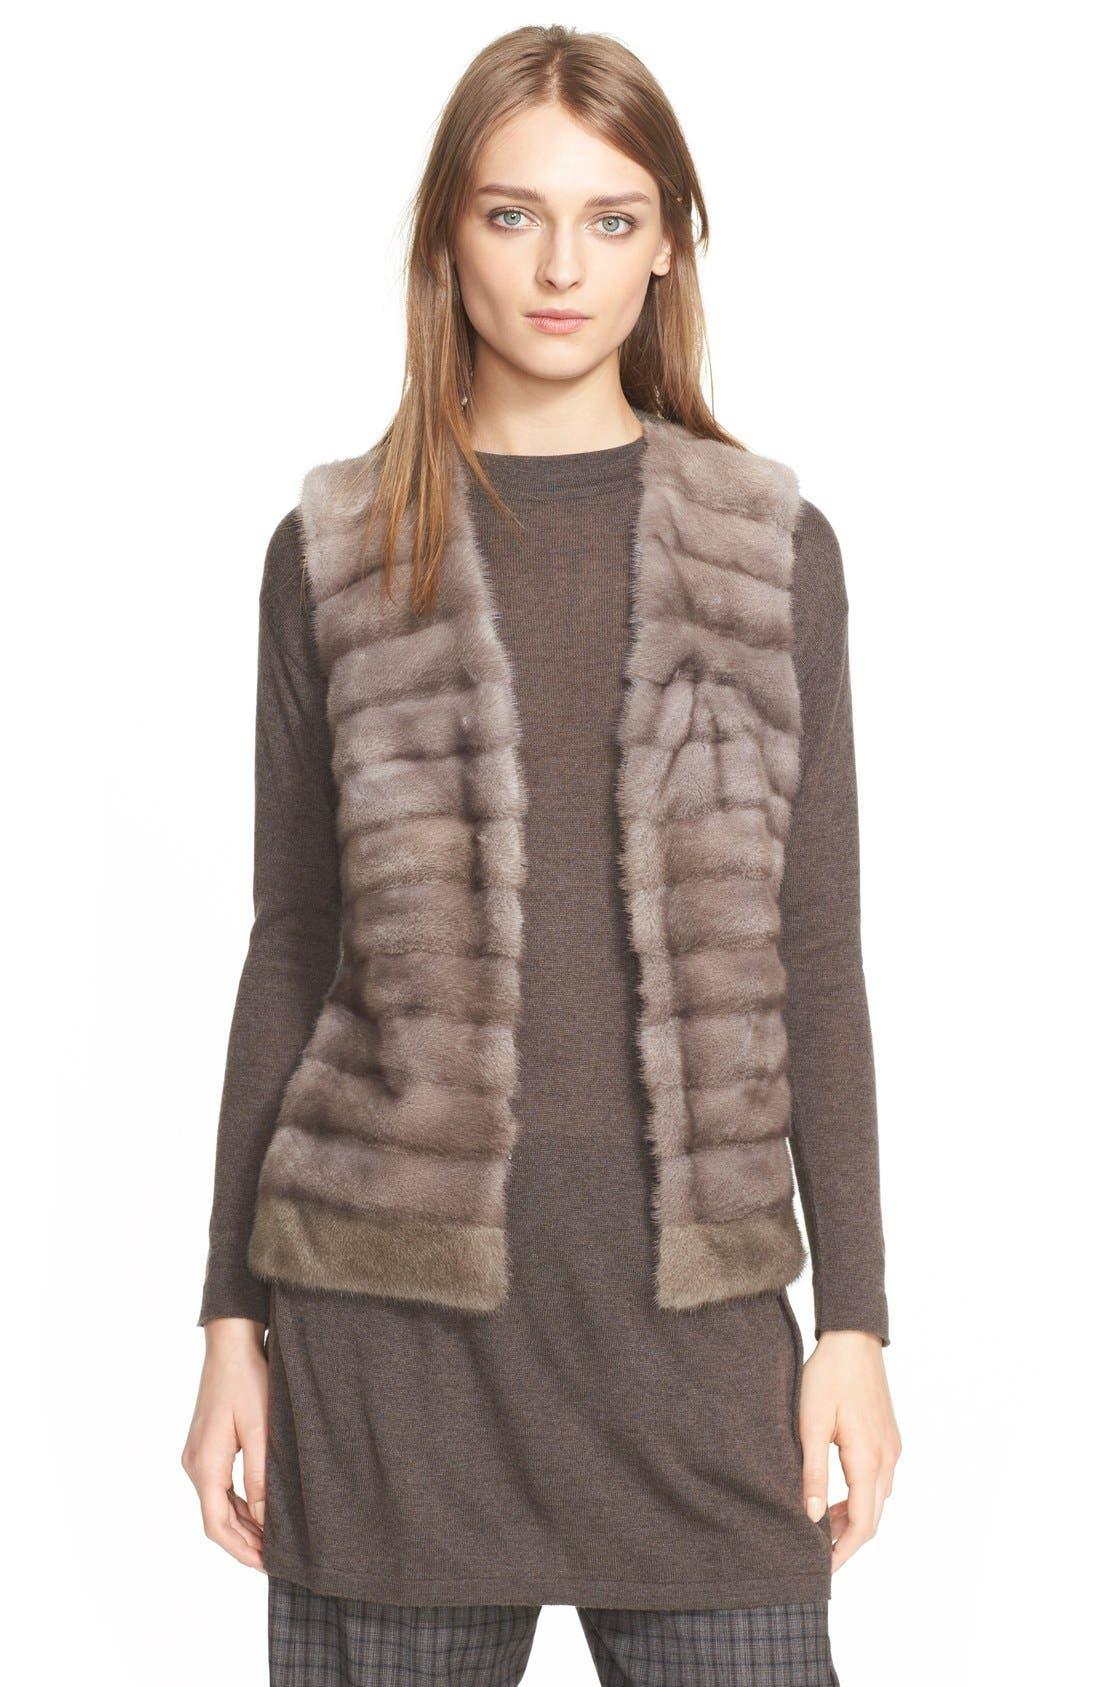 Genuine Mink Fur Vest with Cable Knit Back, Main, color, 078